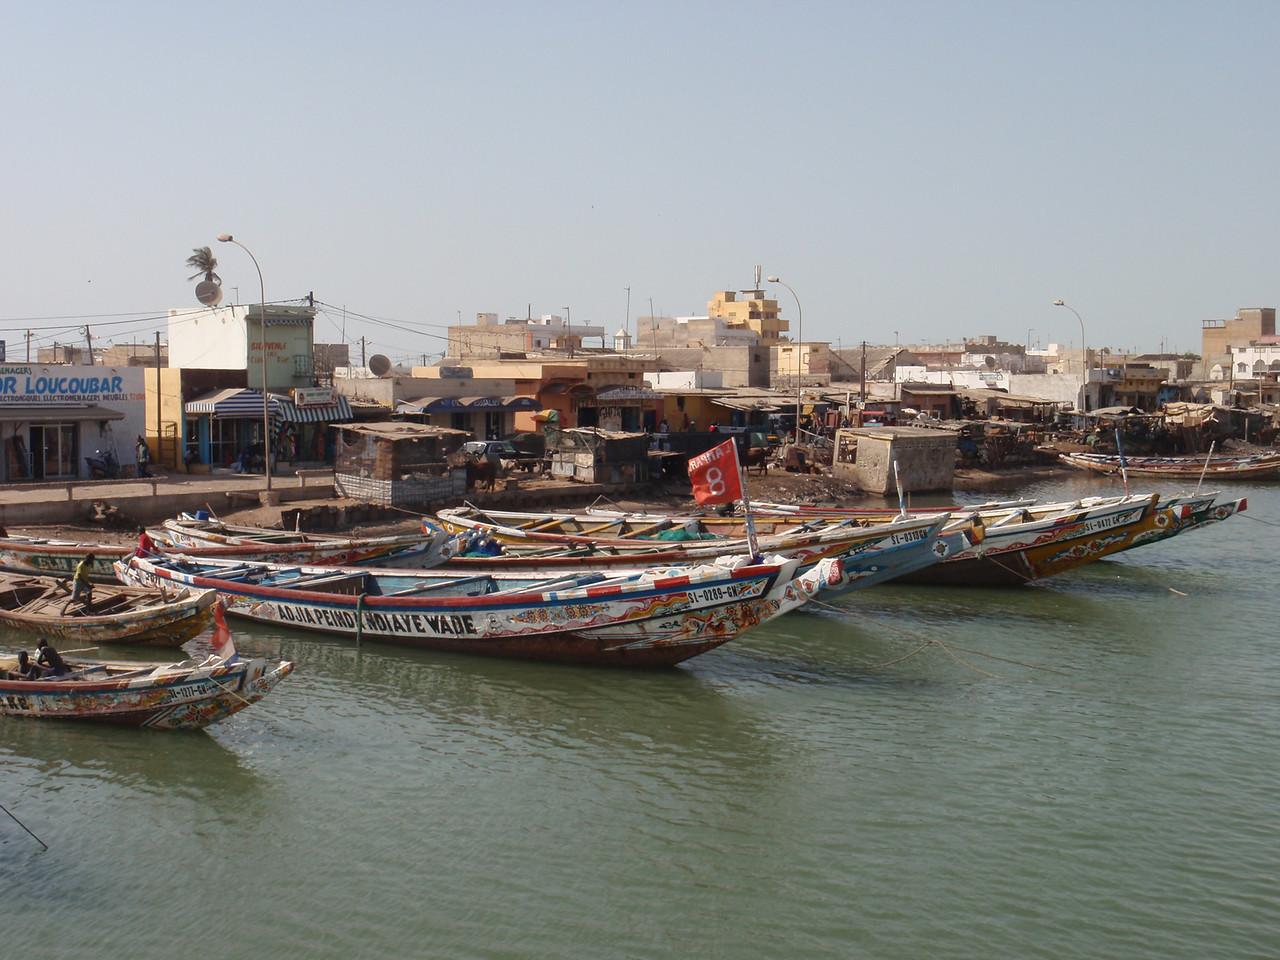 102_Saint Louis  The Senegal River  Fishermen Boats